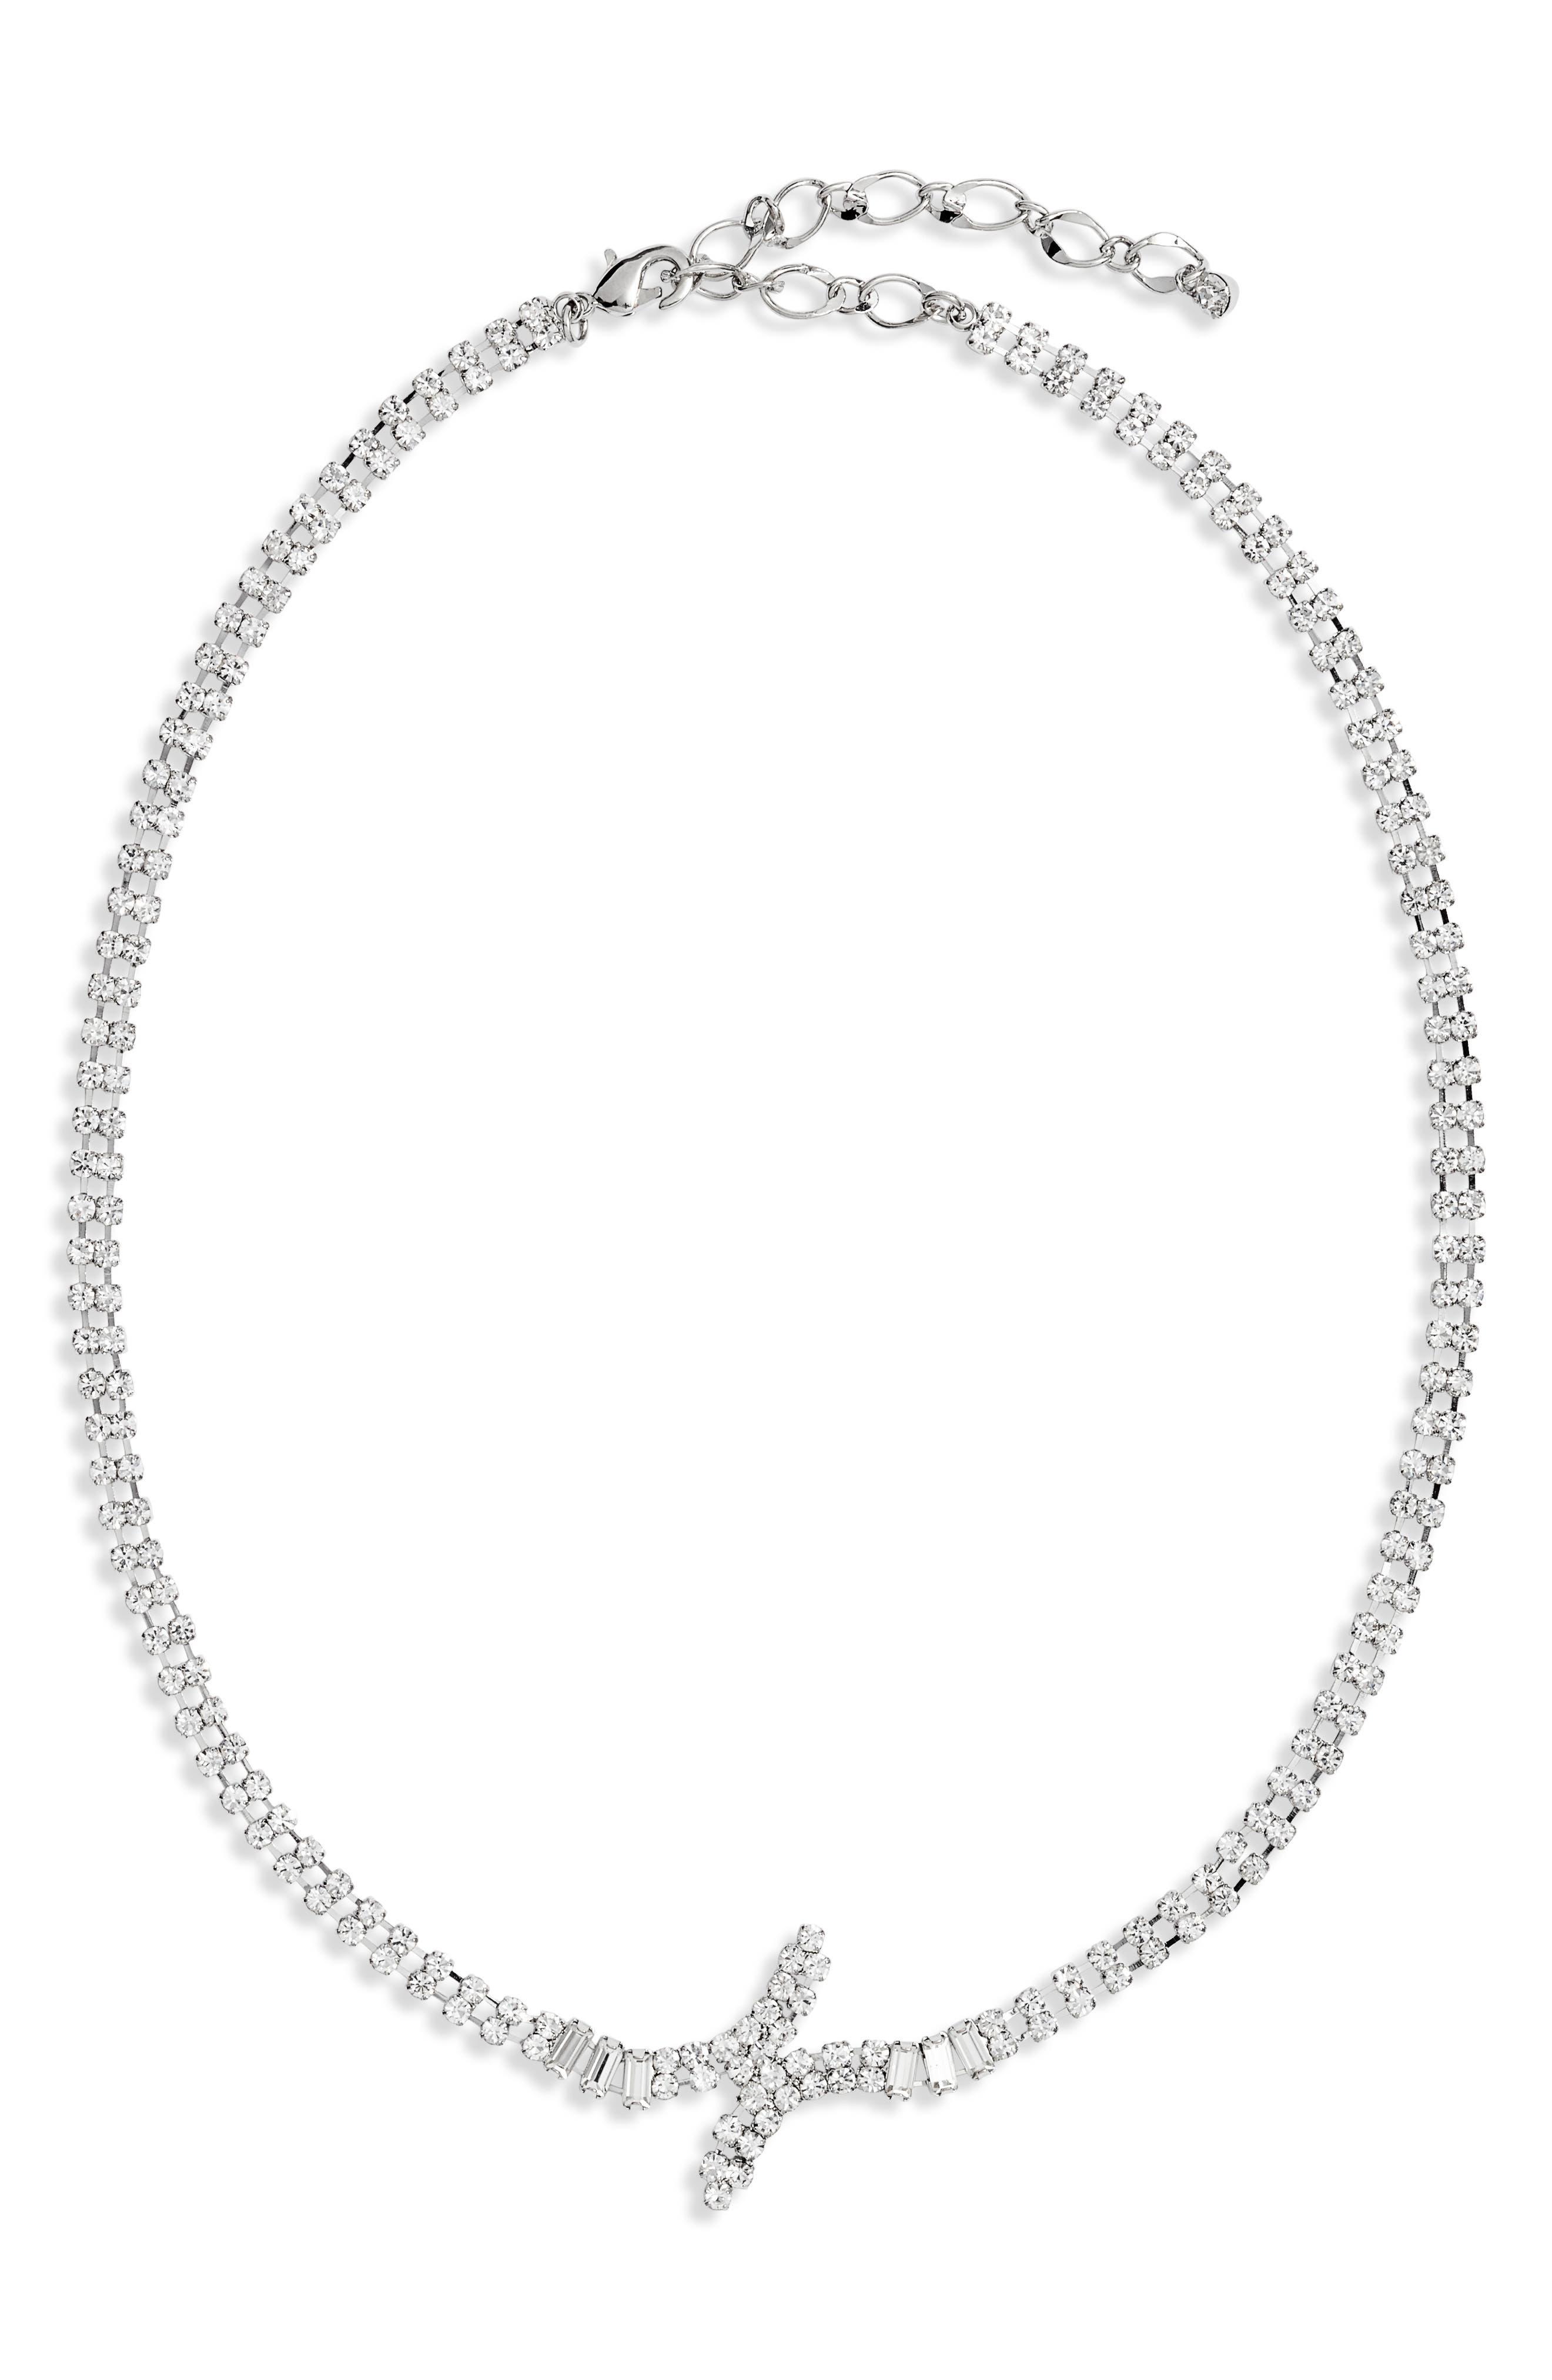 Crisscross Crystal Necklace